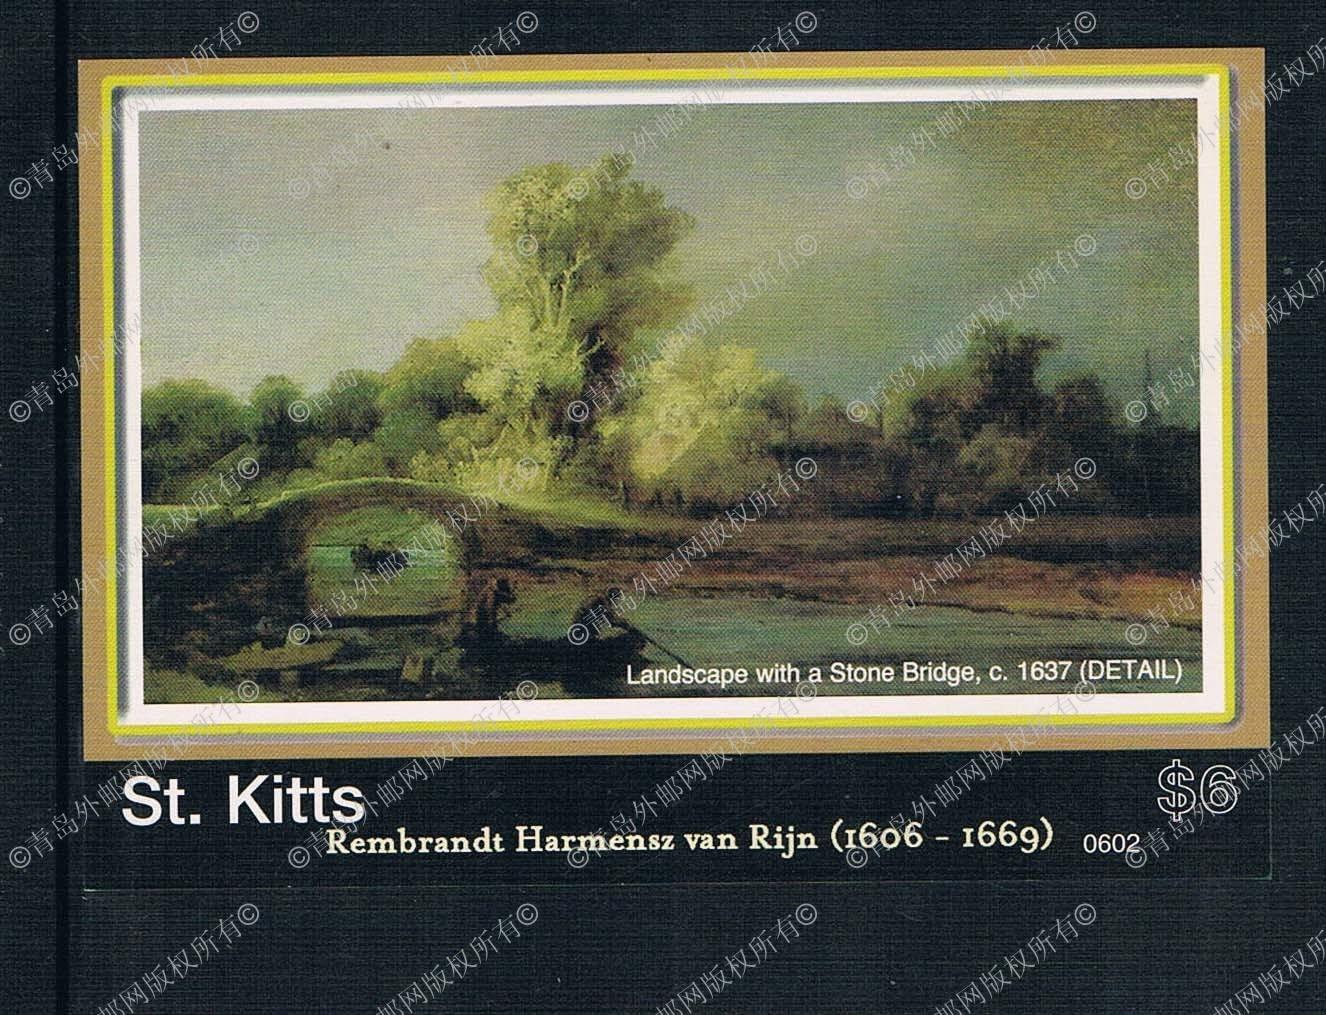 DA0790 2006 Rembrandt painting stone St. Kitts landscape 1M new 0524 stamps люстра на штанге preciosa brilliant 45 0524 006 07 00 07 01